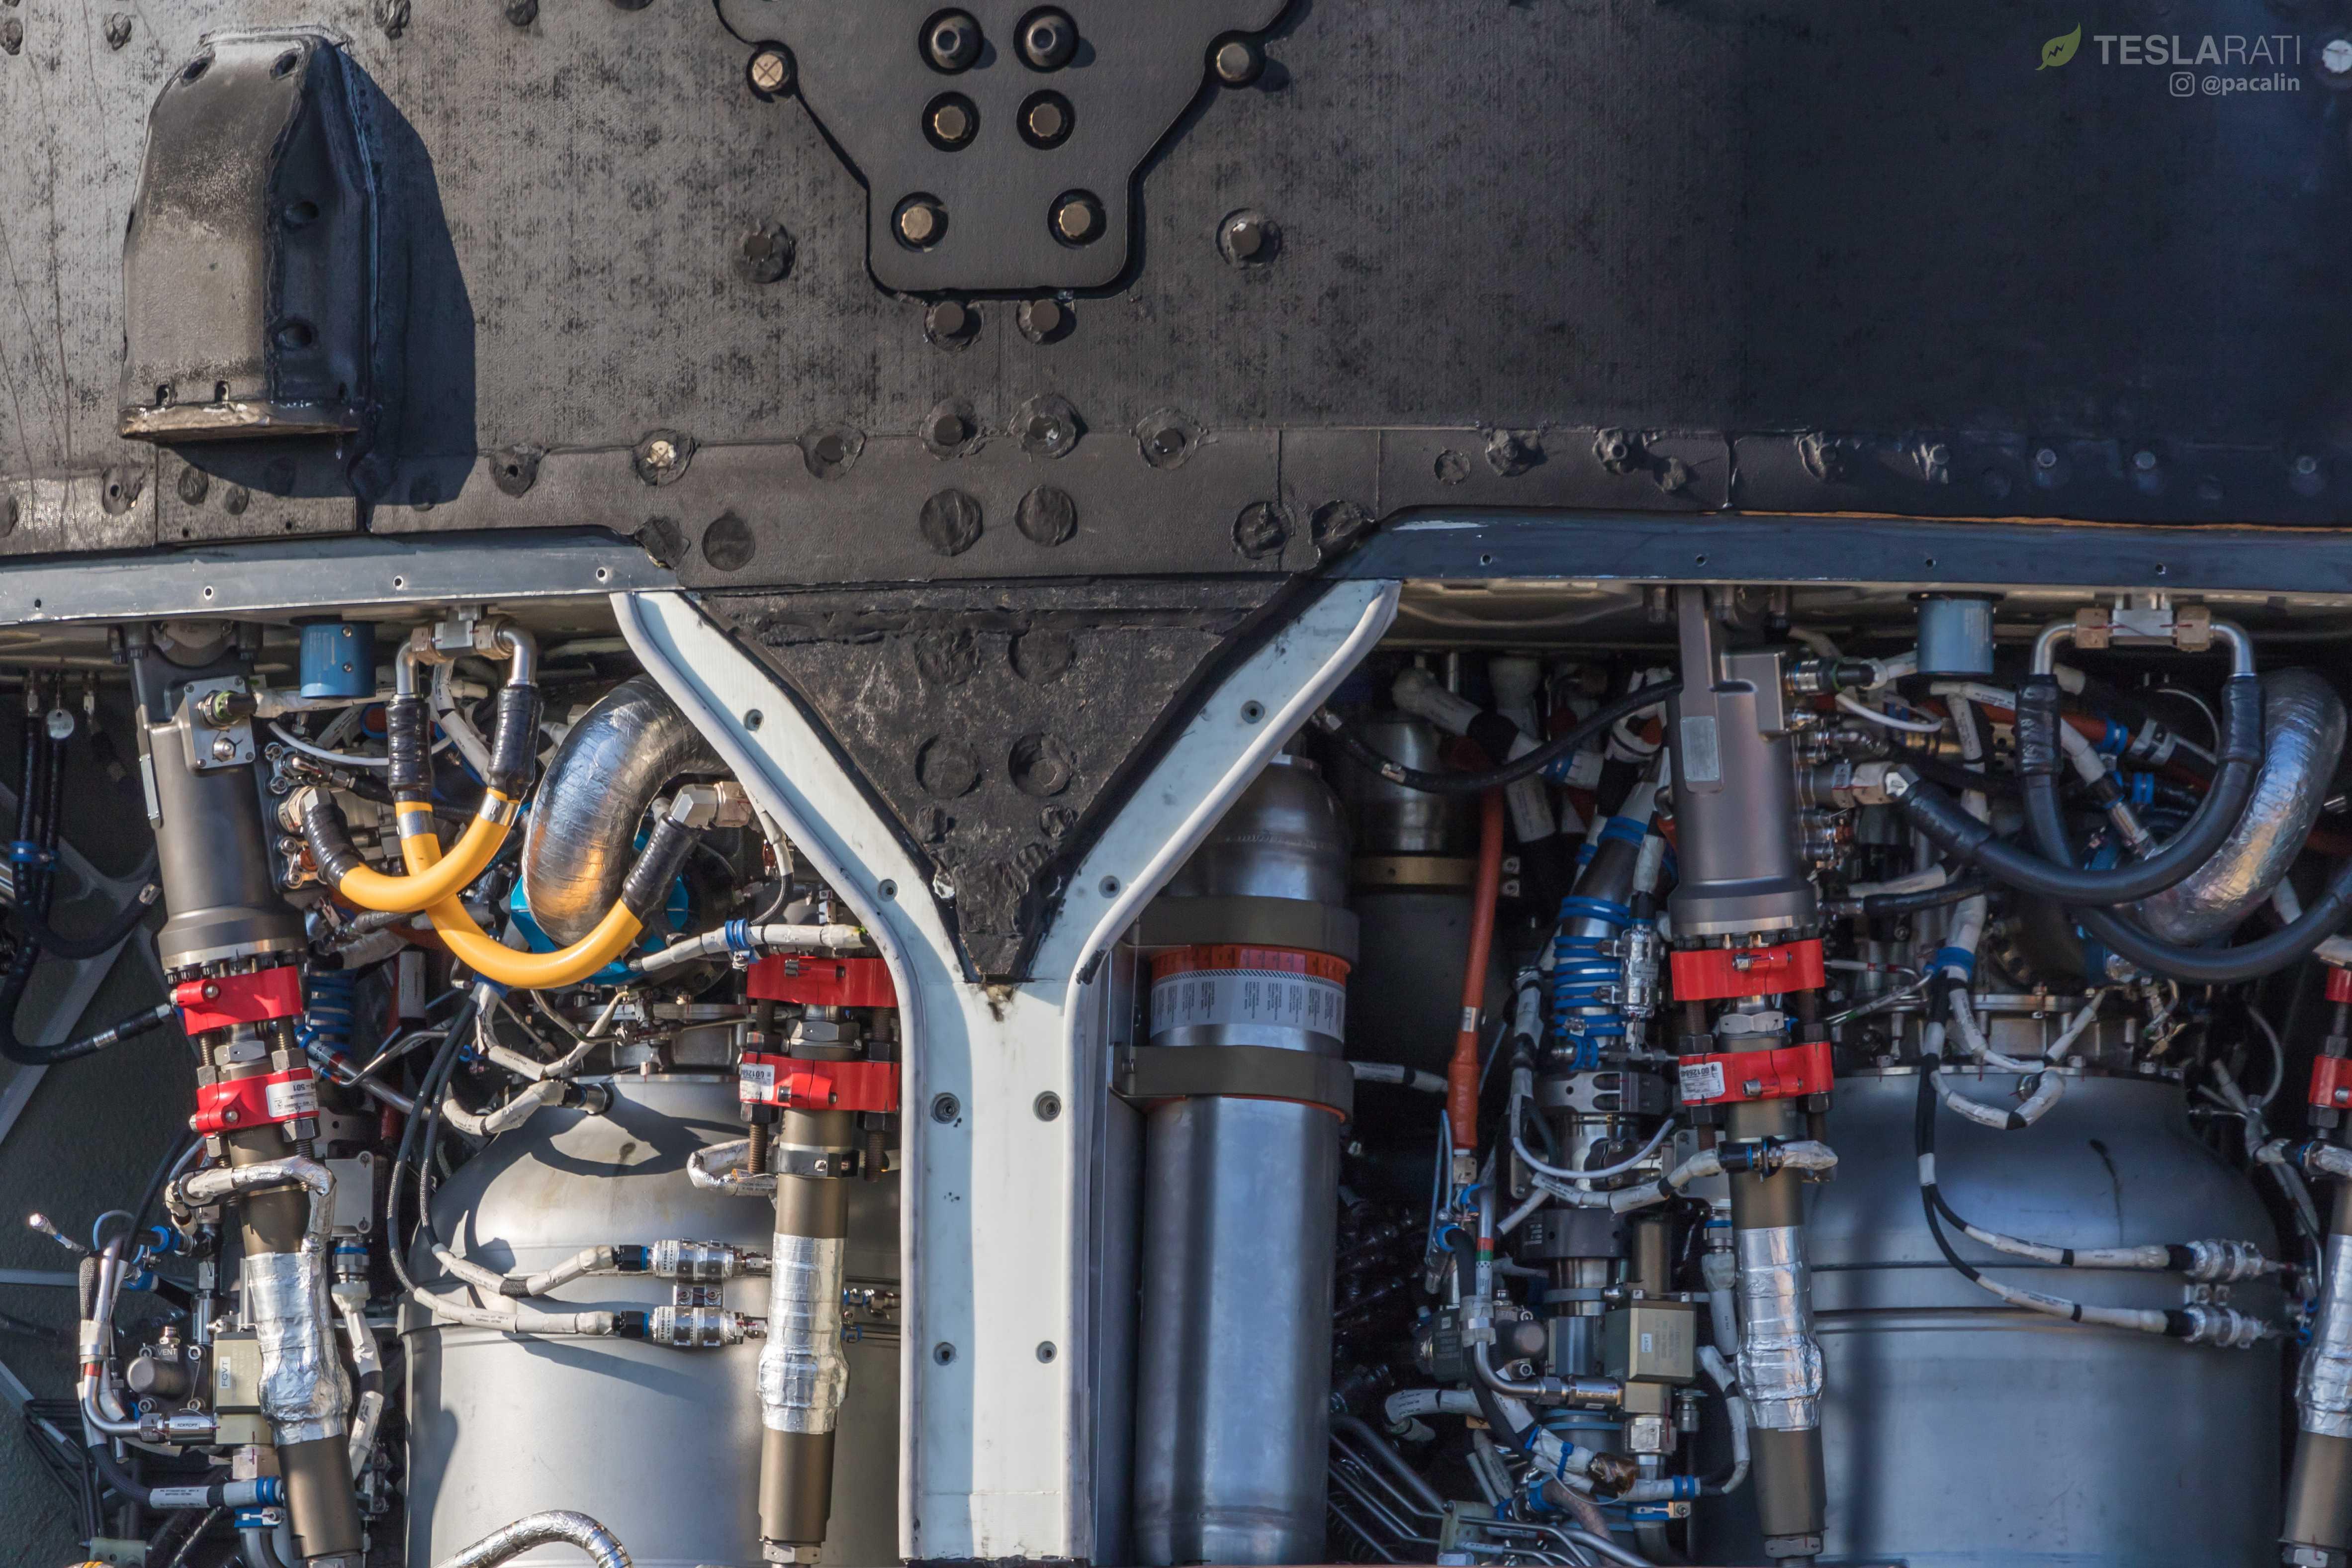 F9 B1048 engine bay and octaweb (Pauline Acalin) (20)(c)